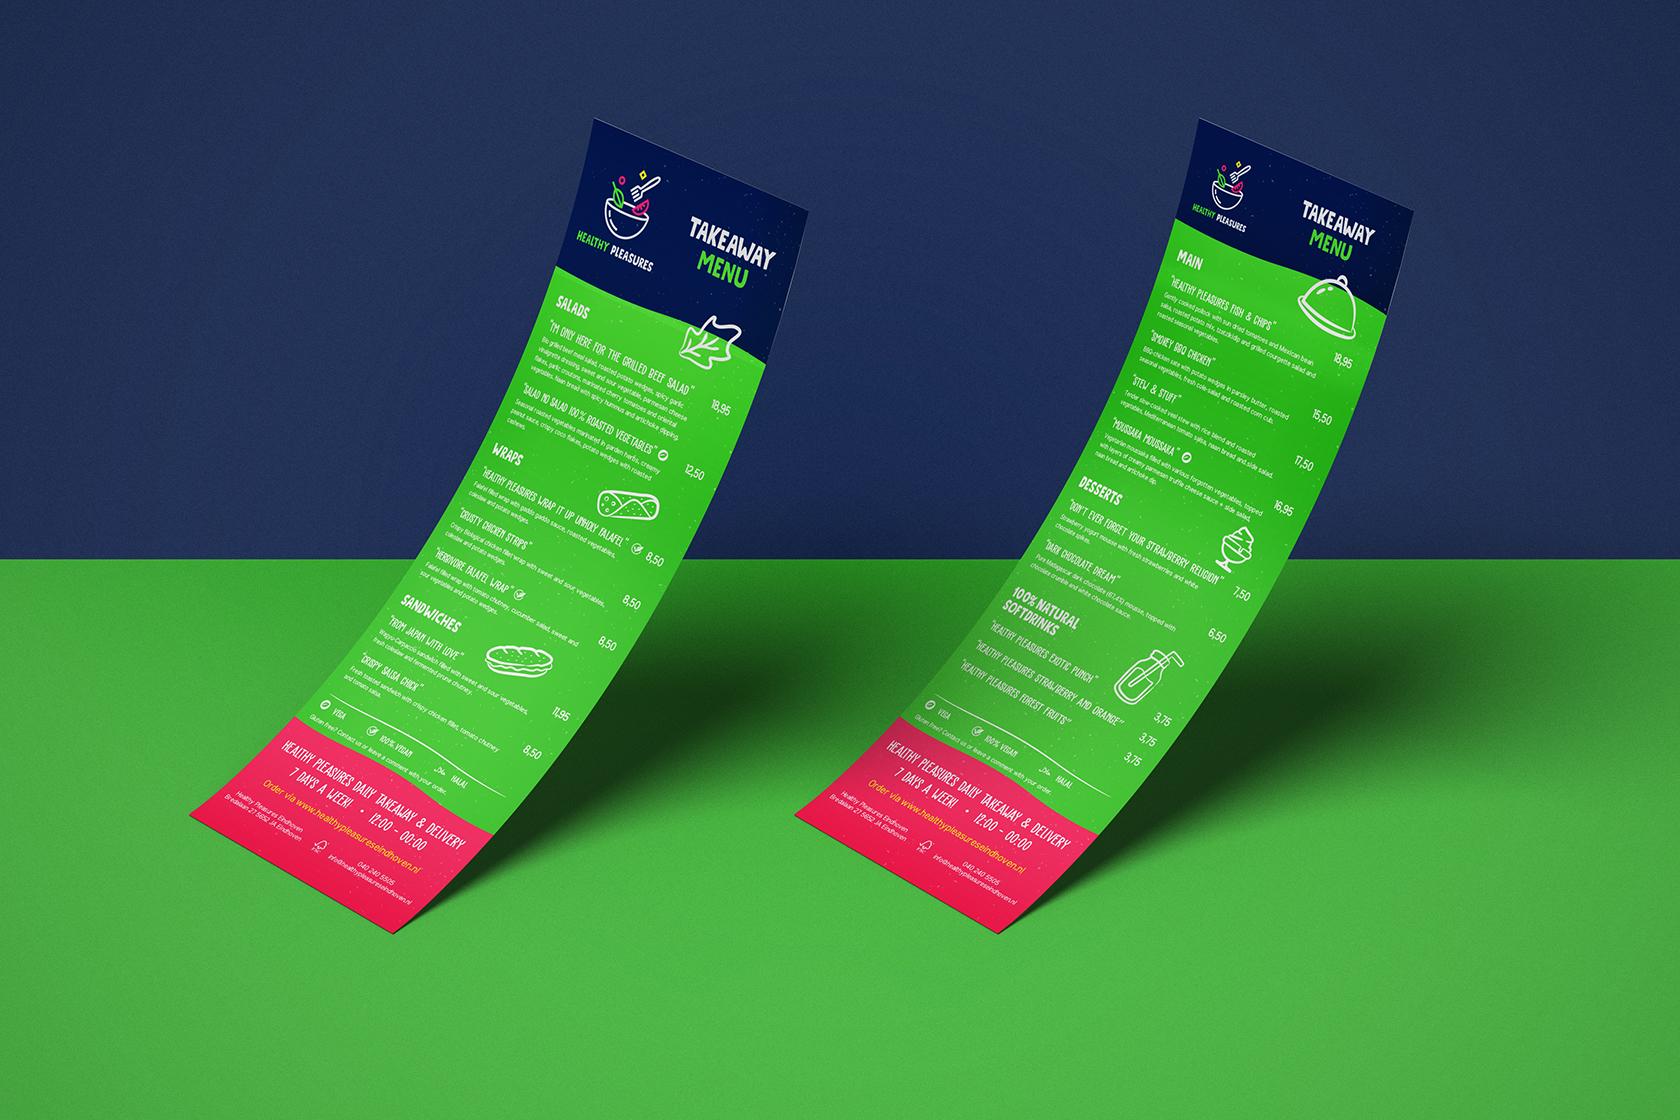 Menukaart ontwerp voor Healthy Pleasures dagkaart